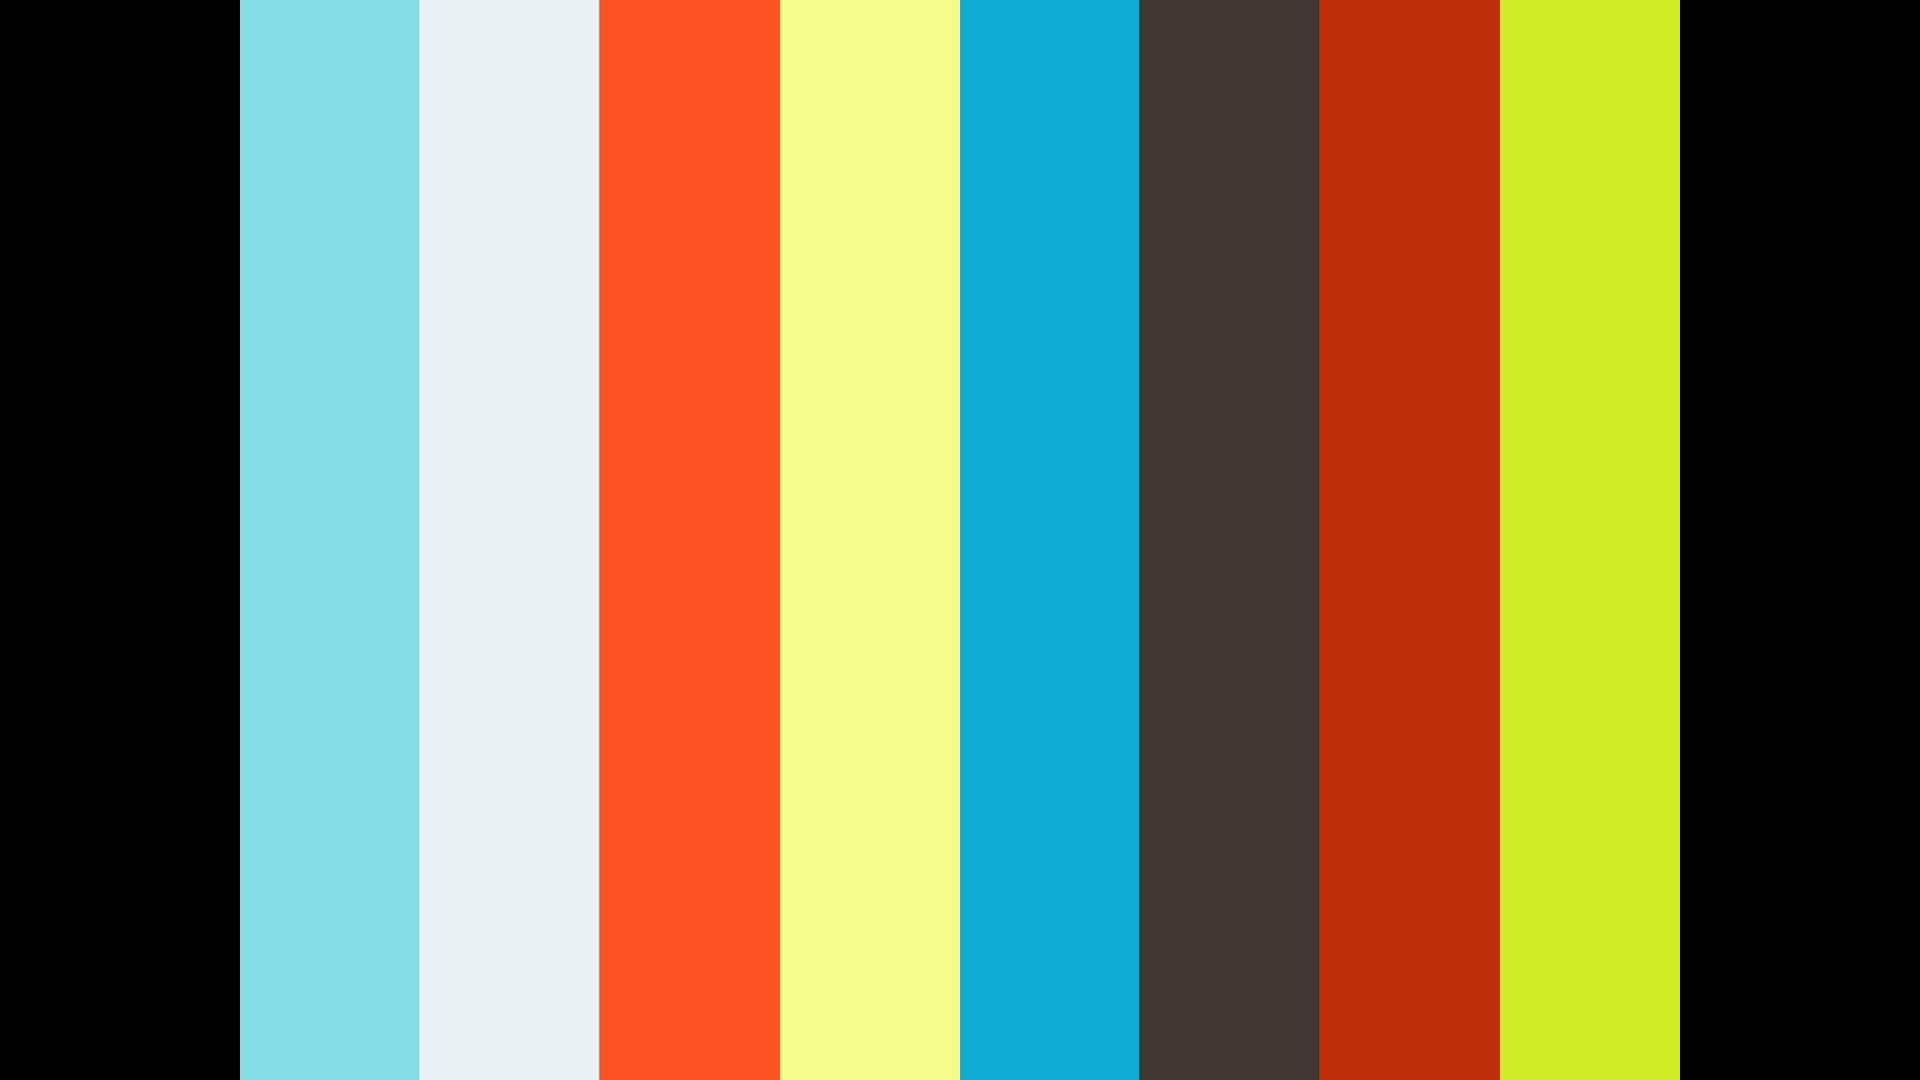 SHAUN - ABSOLUTE 45 (9 AUGUST 2021)